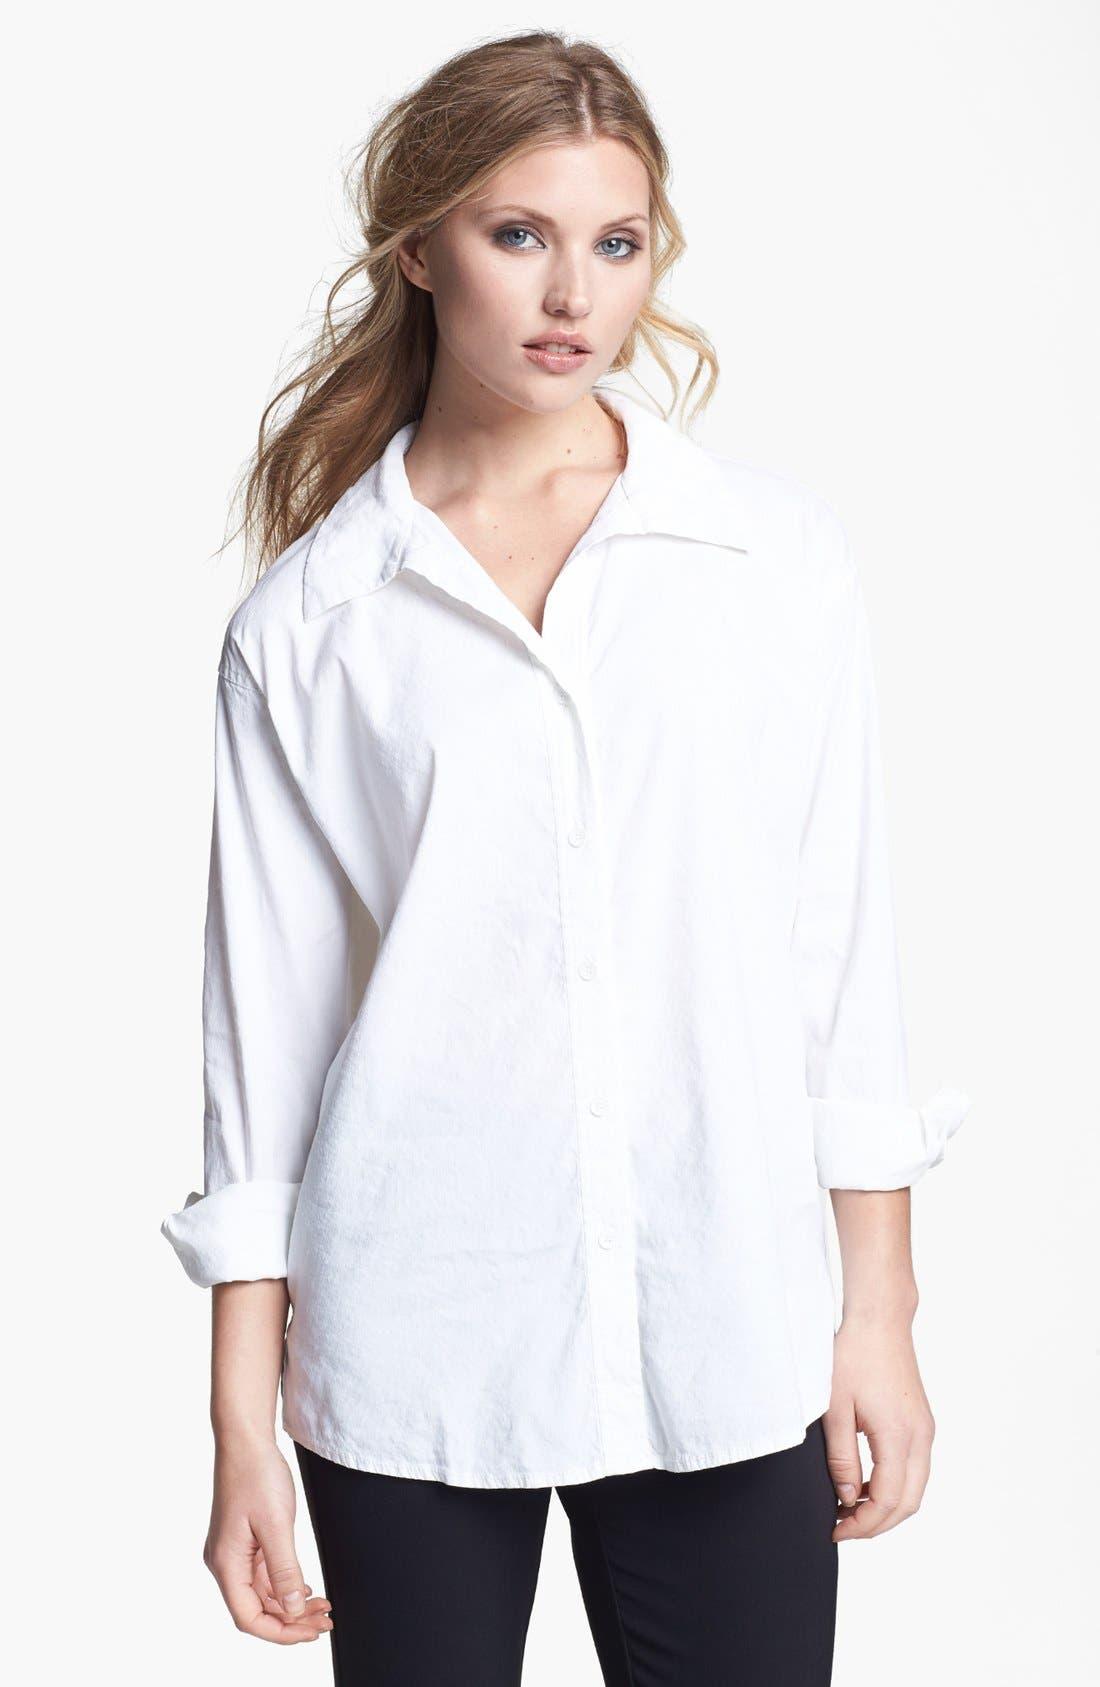 Alternate Image 1 Selected - Eileen Fisher Stretch Linen Blend Oversized Shirt (Regular & Petite)